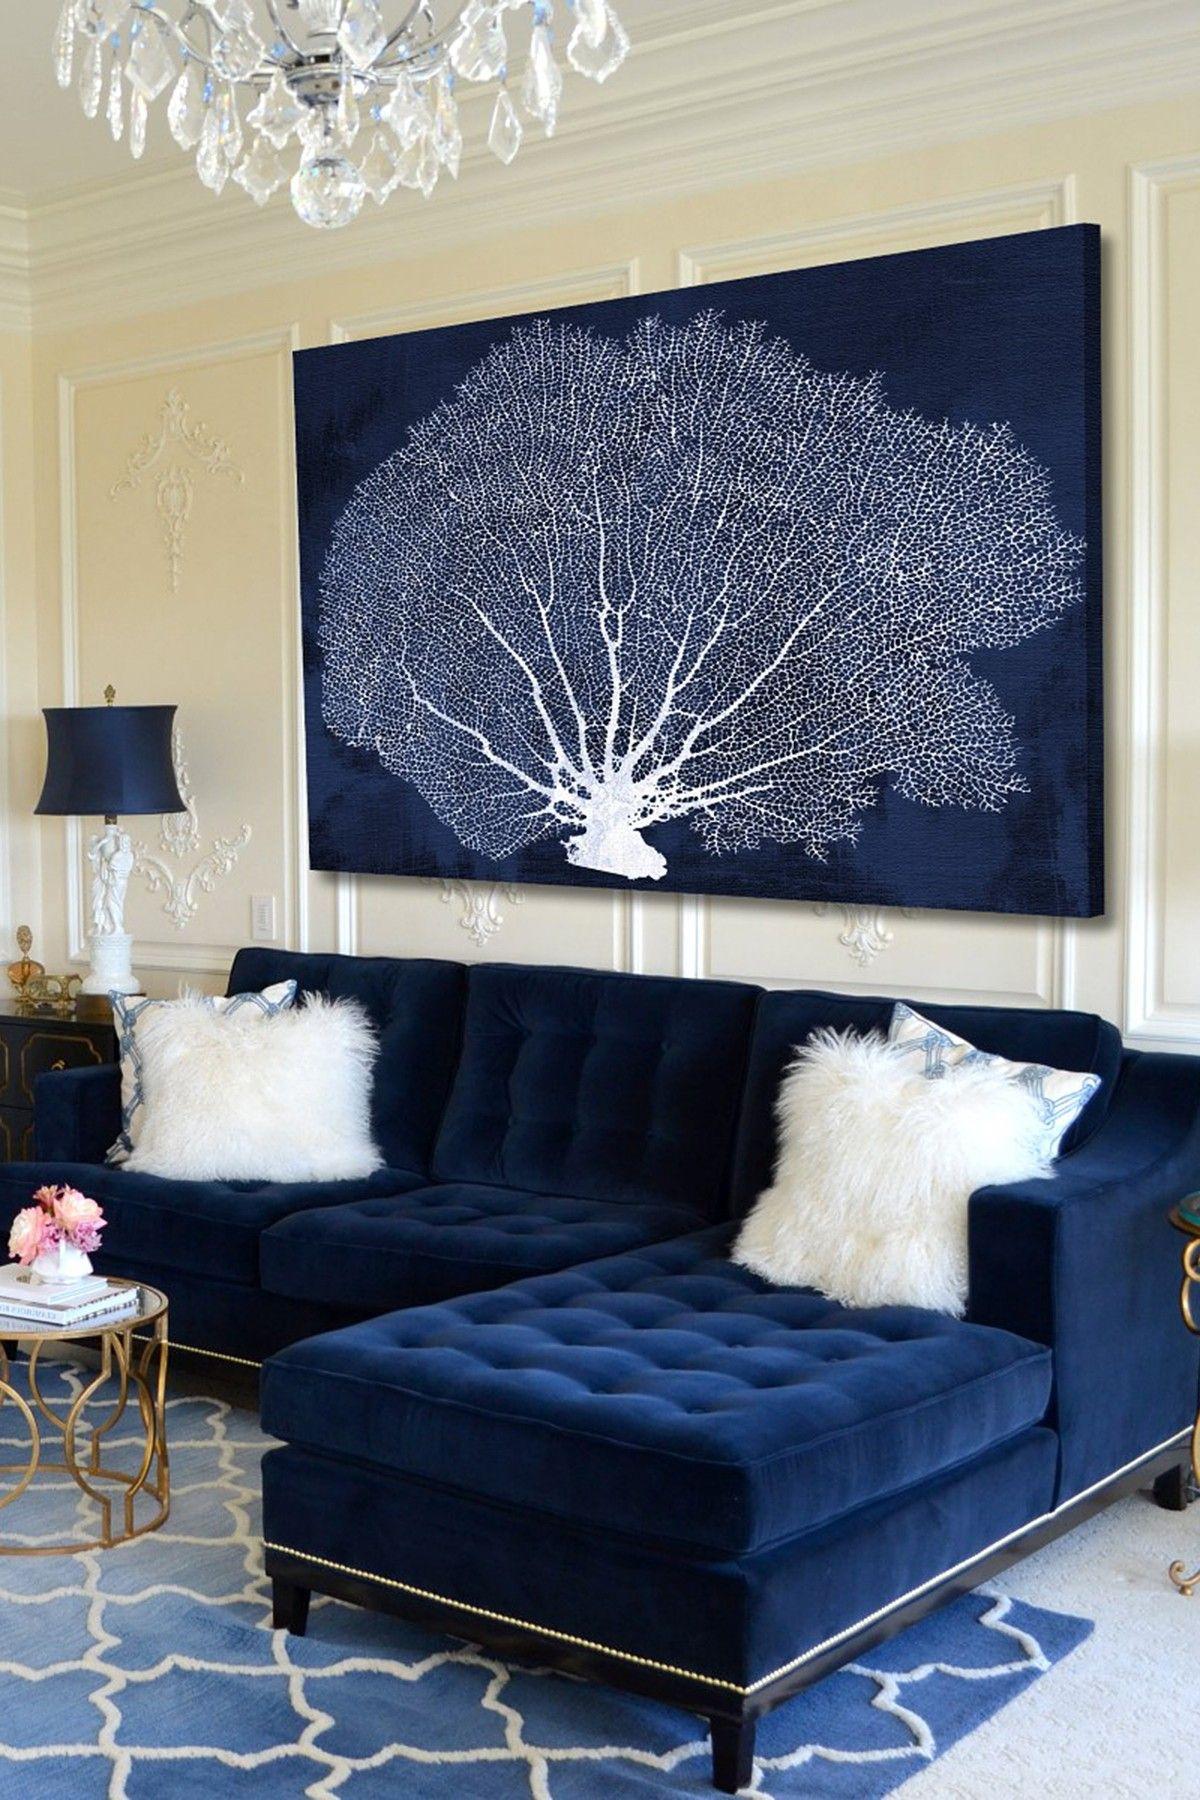 Coral fan cyanotype canvas wall art on hautelook for the home